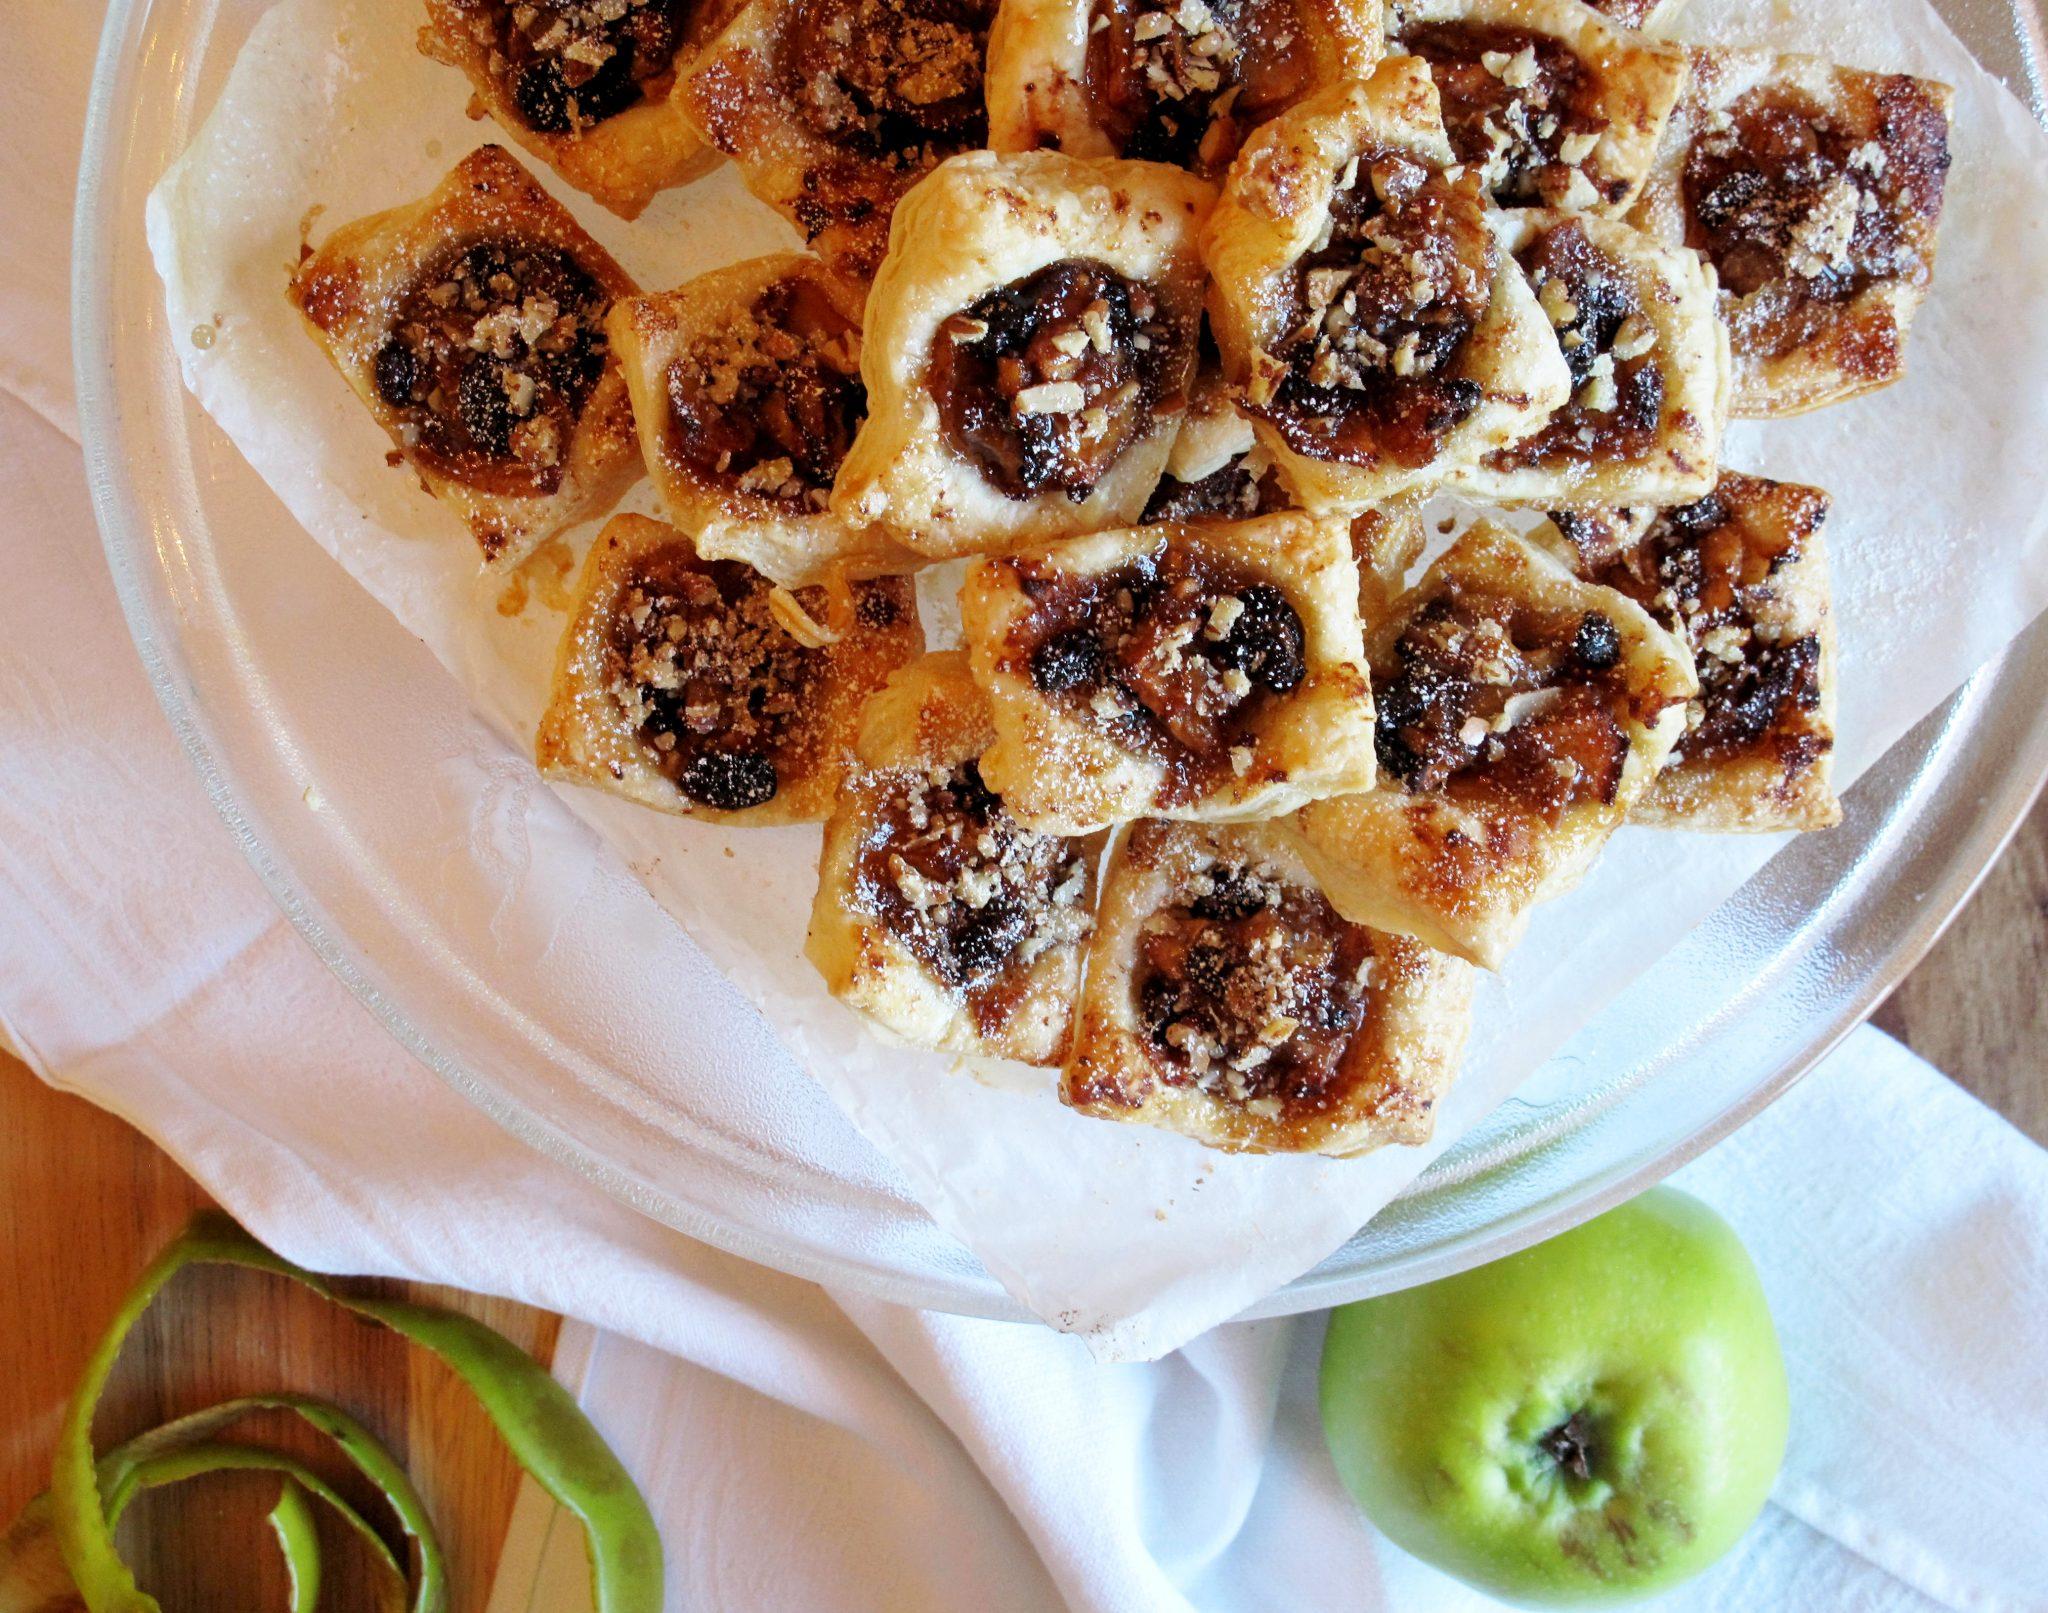 Vegan Cinnamon Apple Salted Caramel Pastries